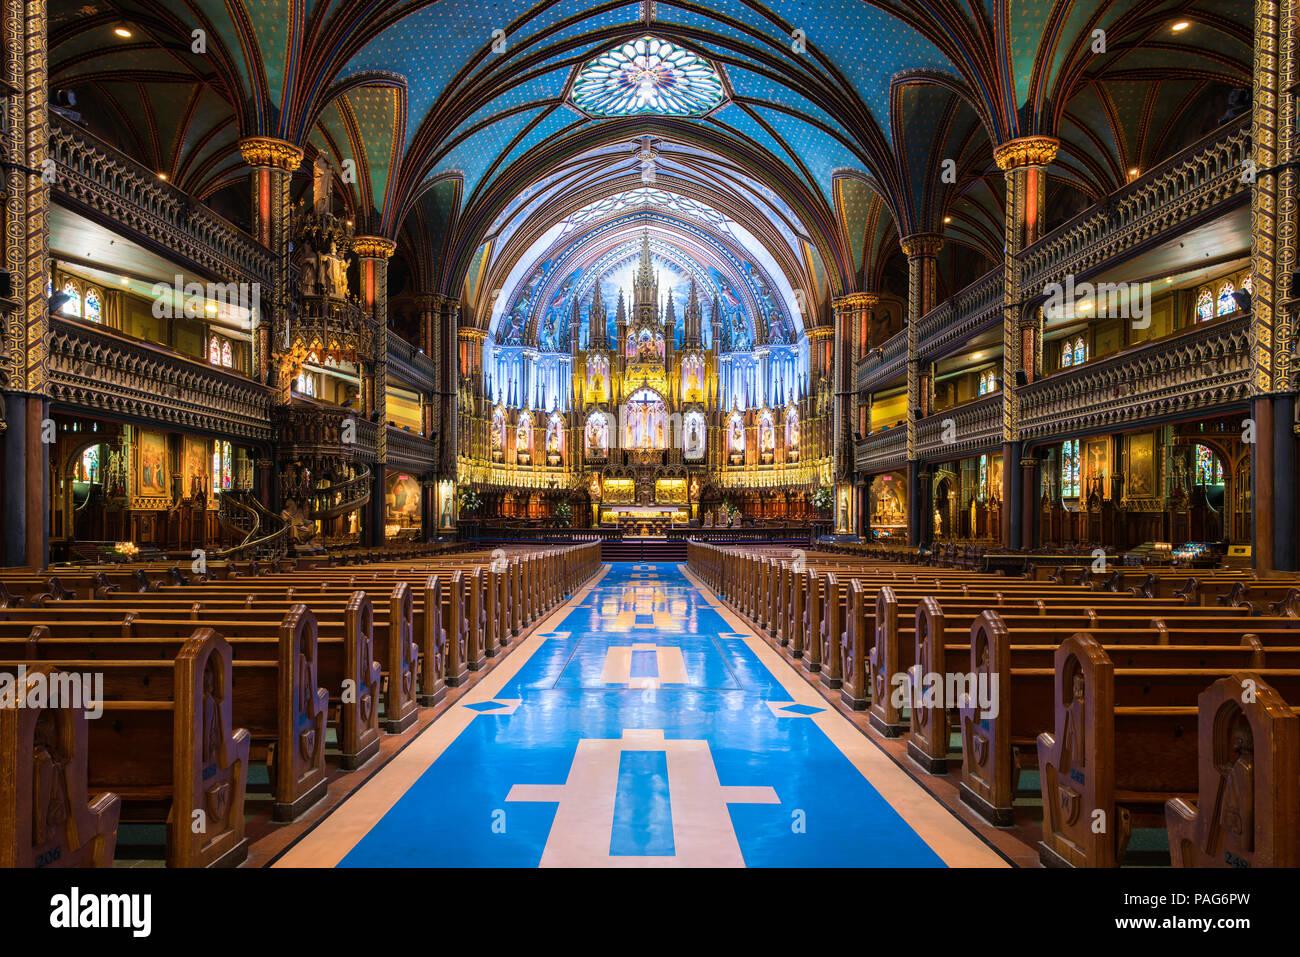 The interior of the Notre-Dame Basilica, Montreal, Quebec, Canada - Stock Image